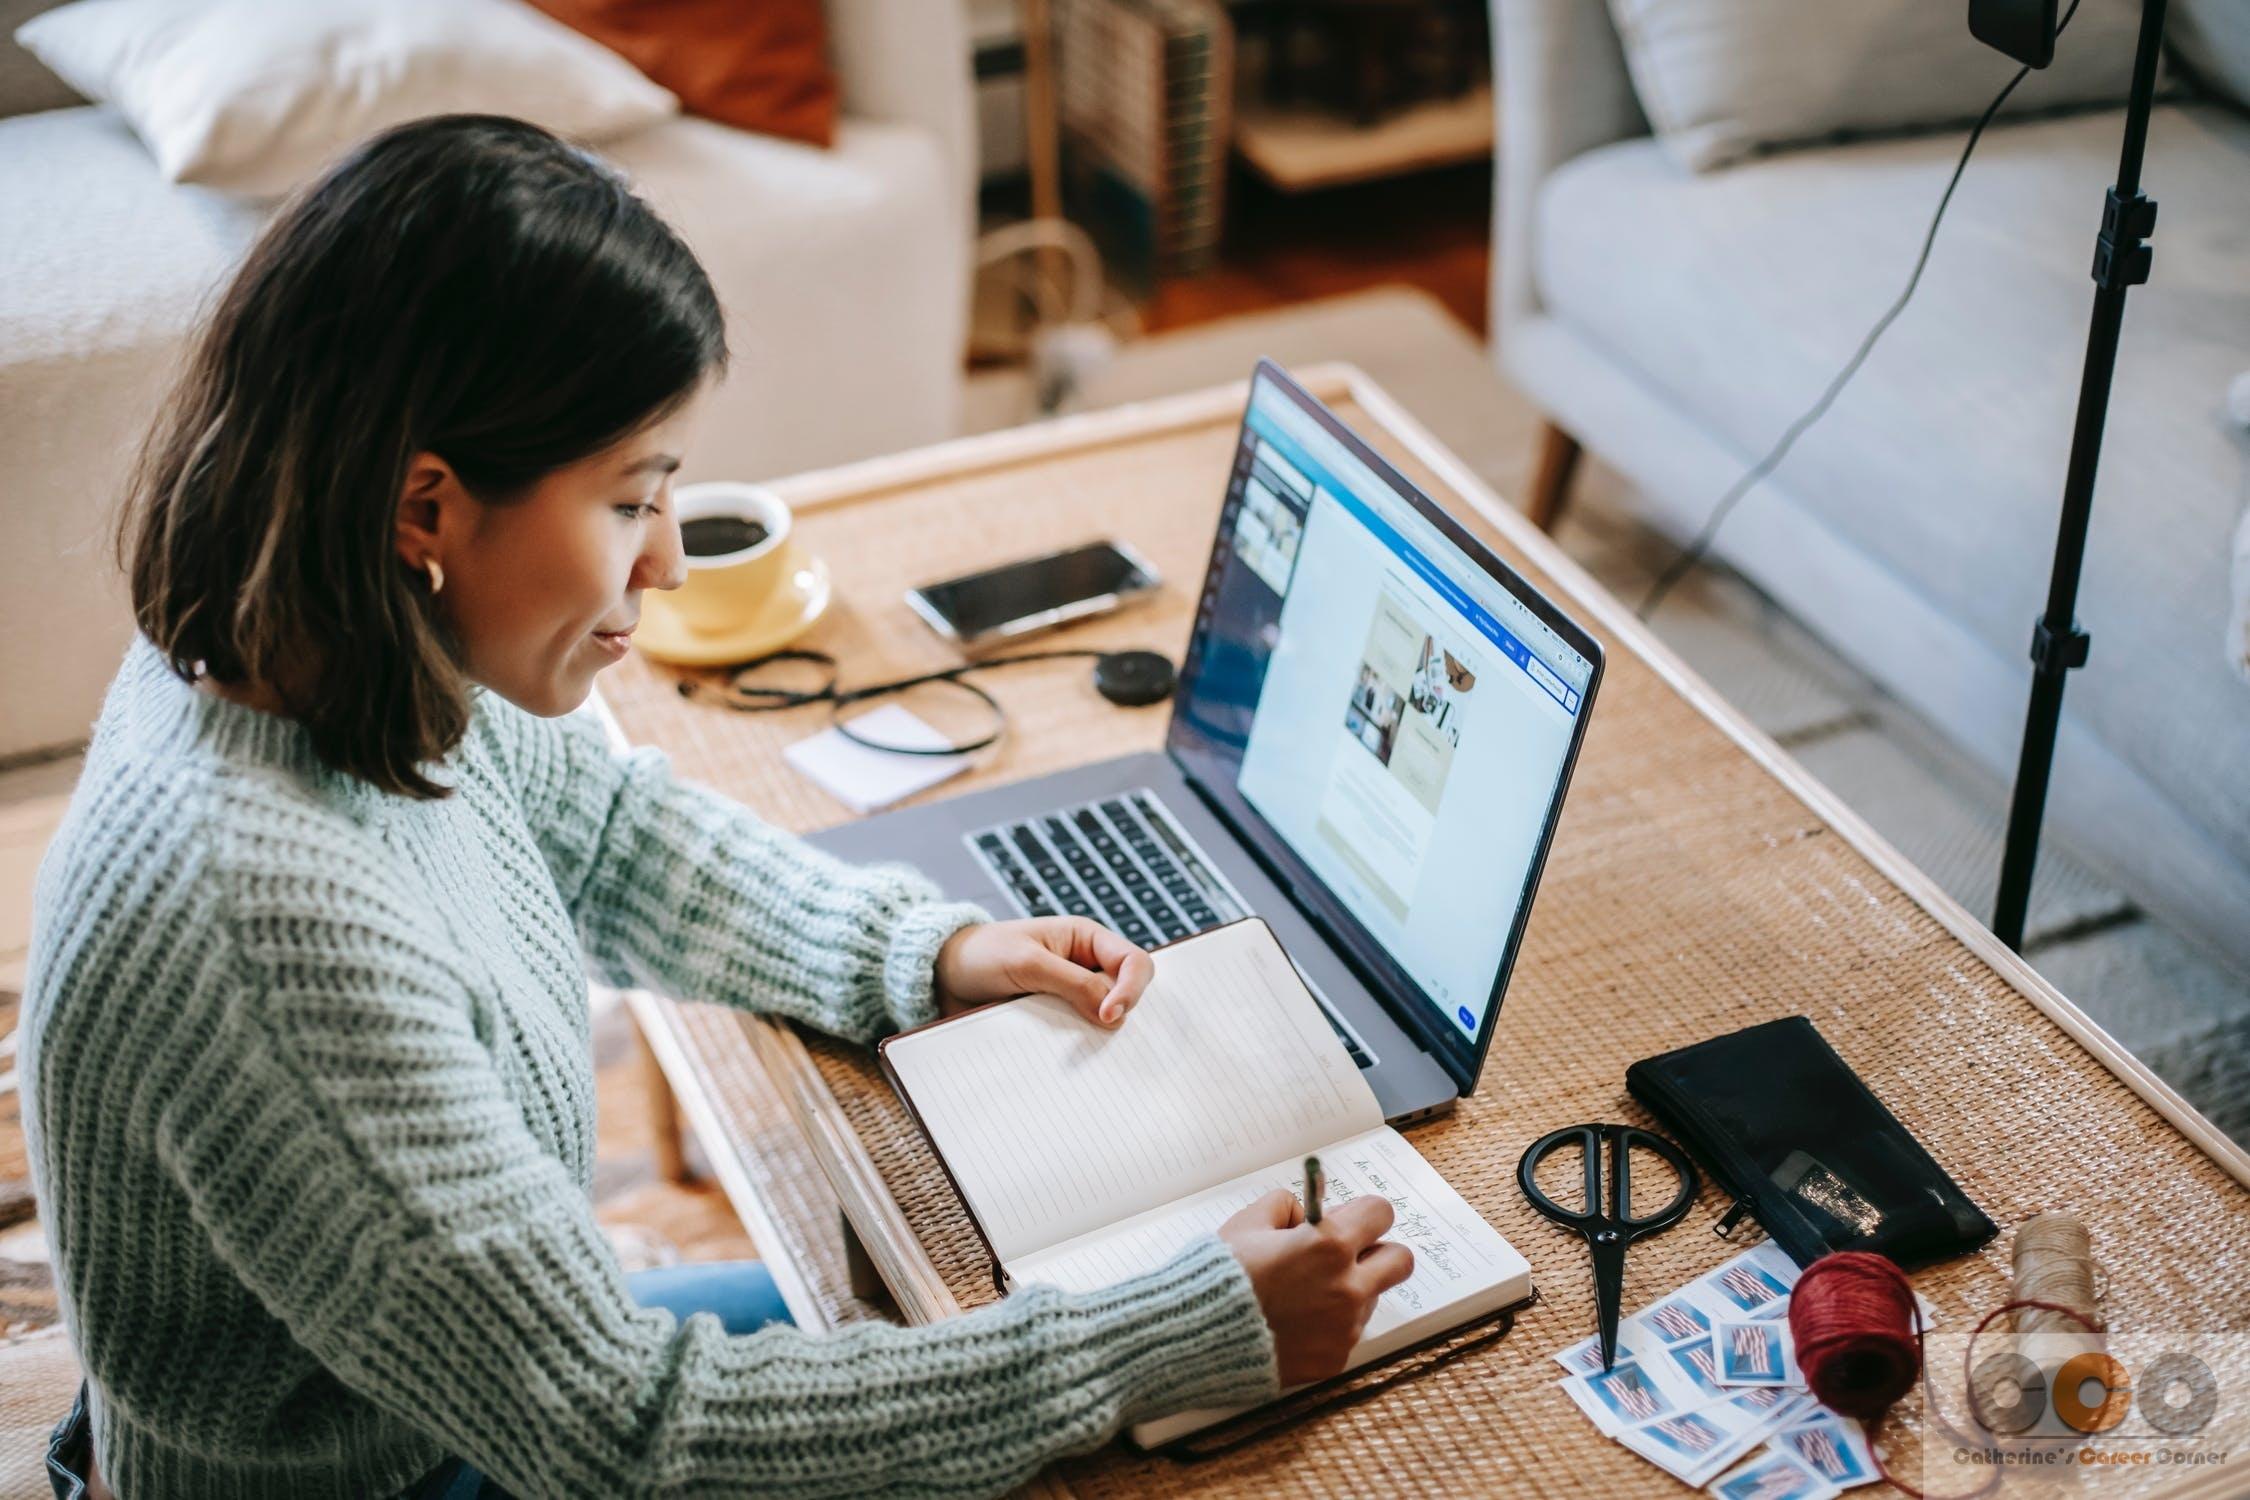 Women to Improve Career Development